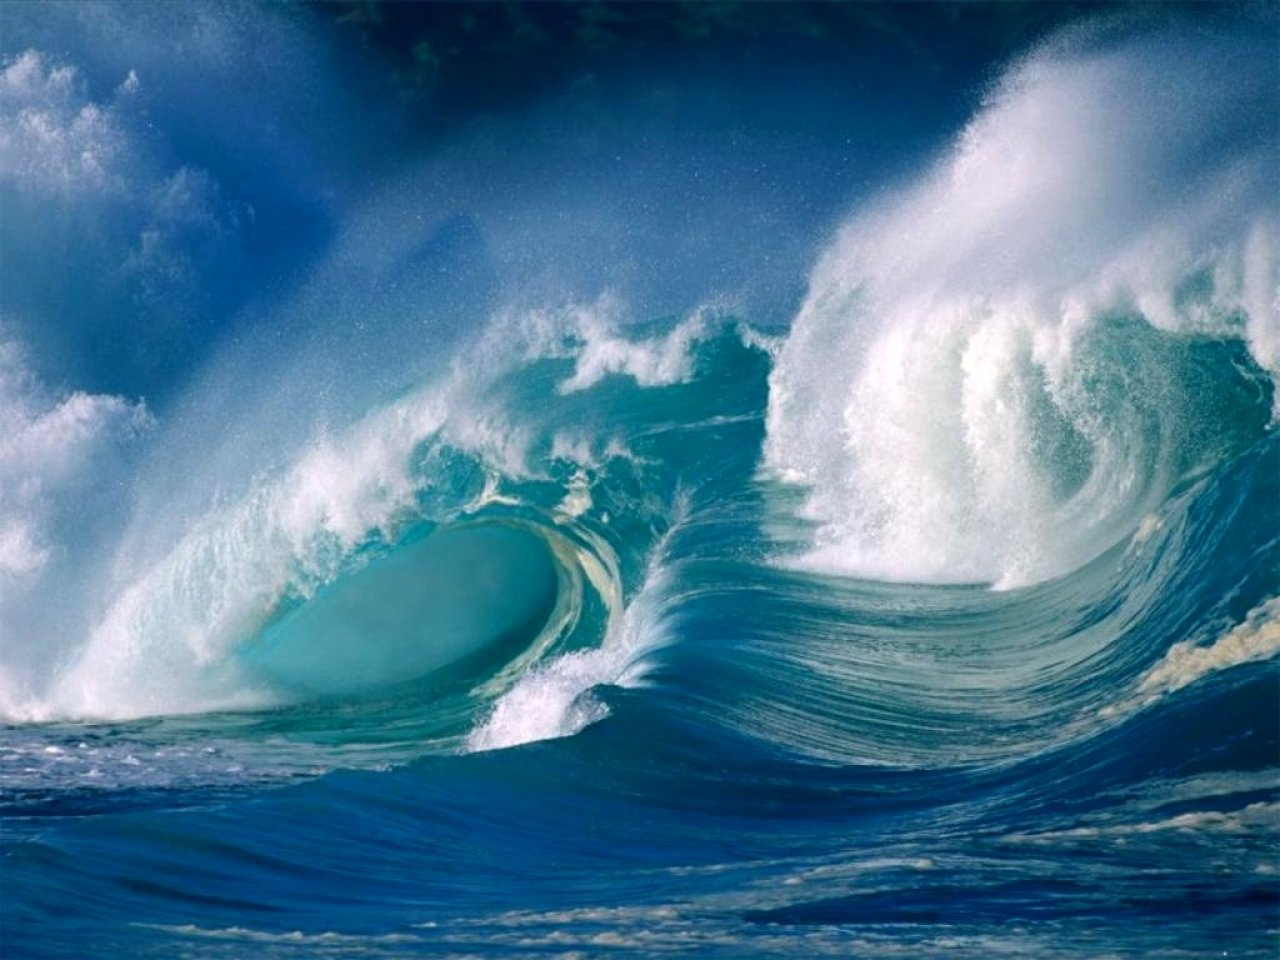 free desktop wallpaper of crushing ocean waves crushing ocean waves 1280x960